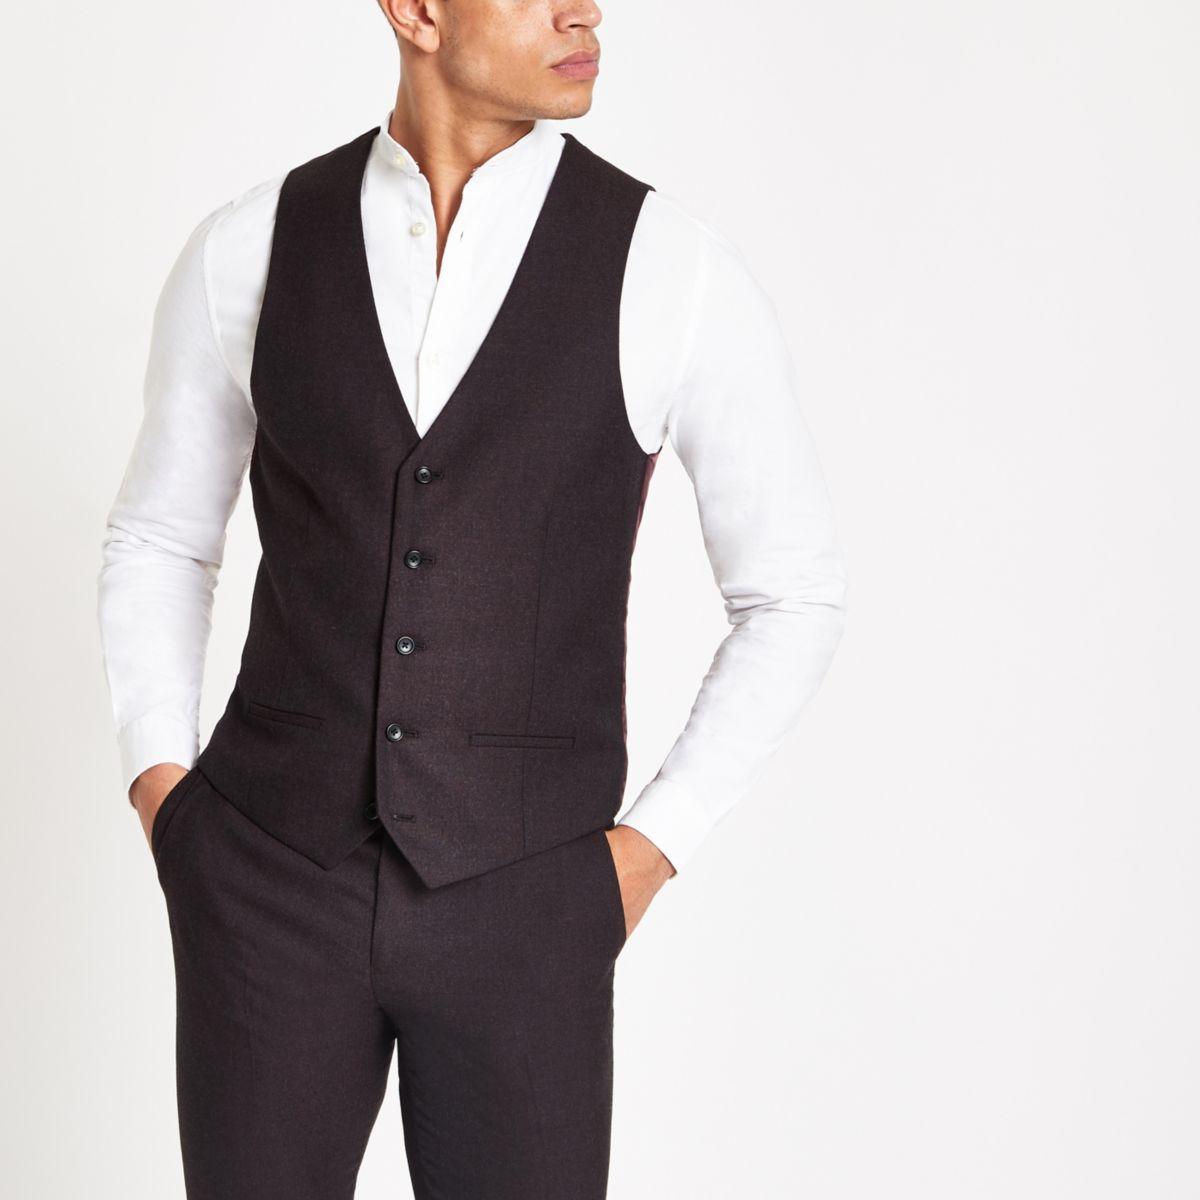 Dark purple suit waistcoat